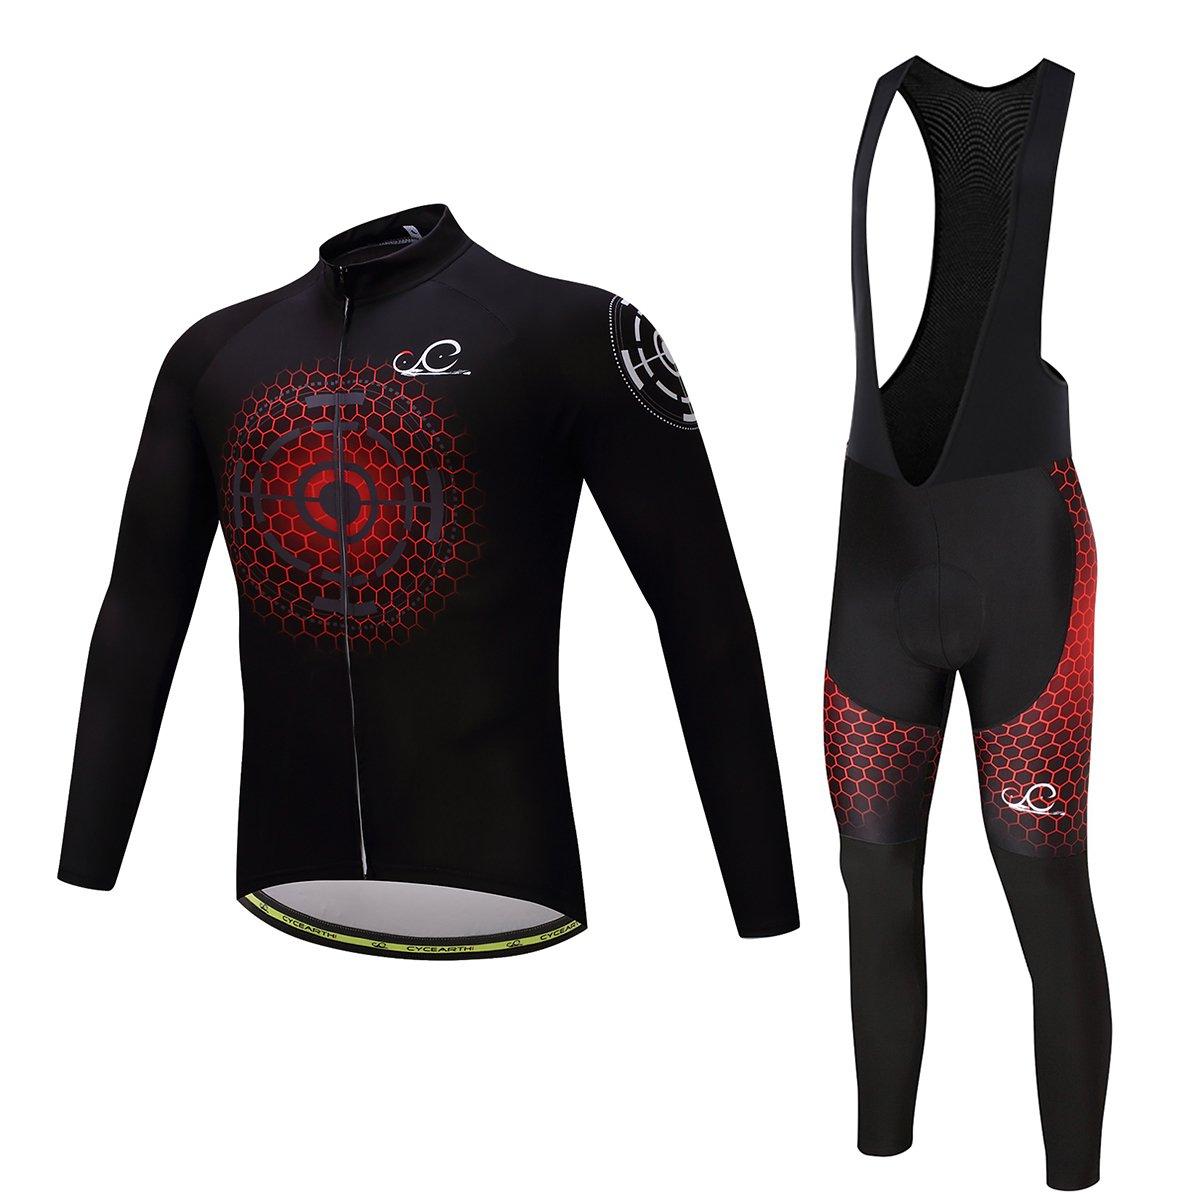 Cycearth Cycling Jersey Long Sleeve Set Men Winter Fleece Thermal Jackets Black Bib Pant (M, Ce603) by Cycearth